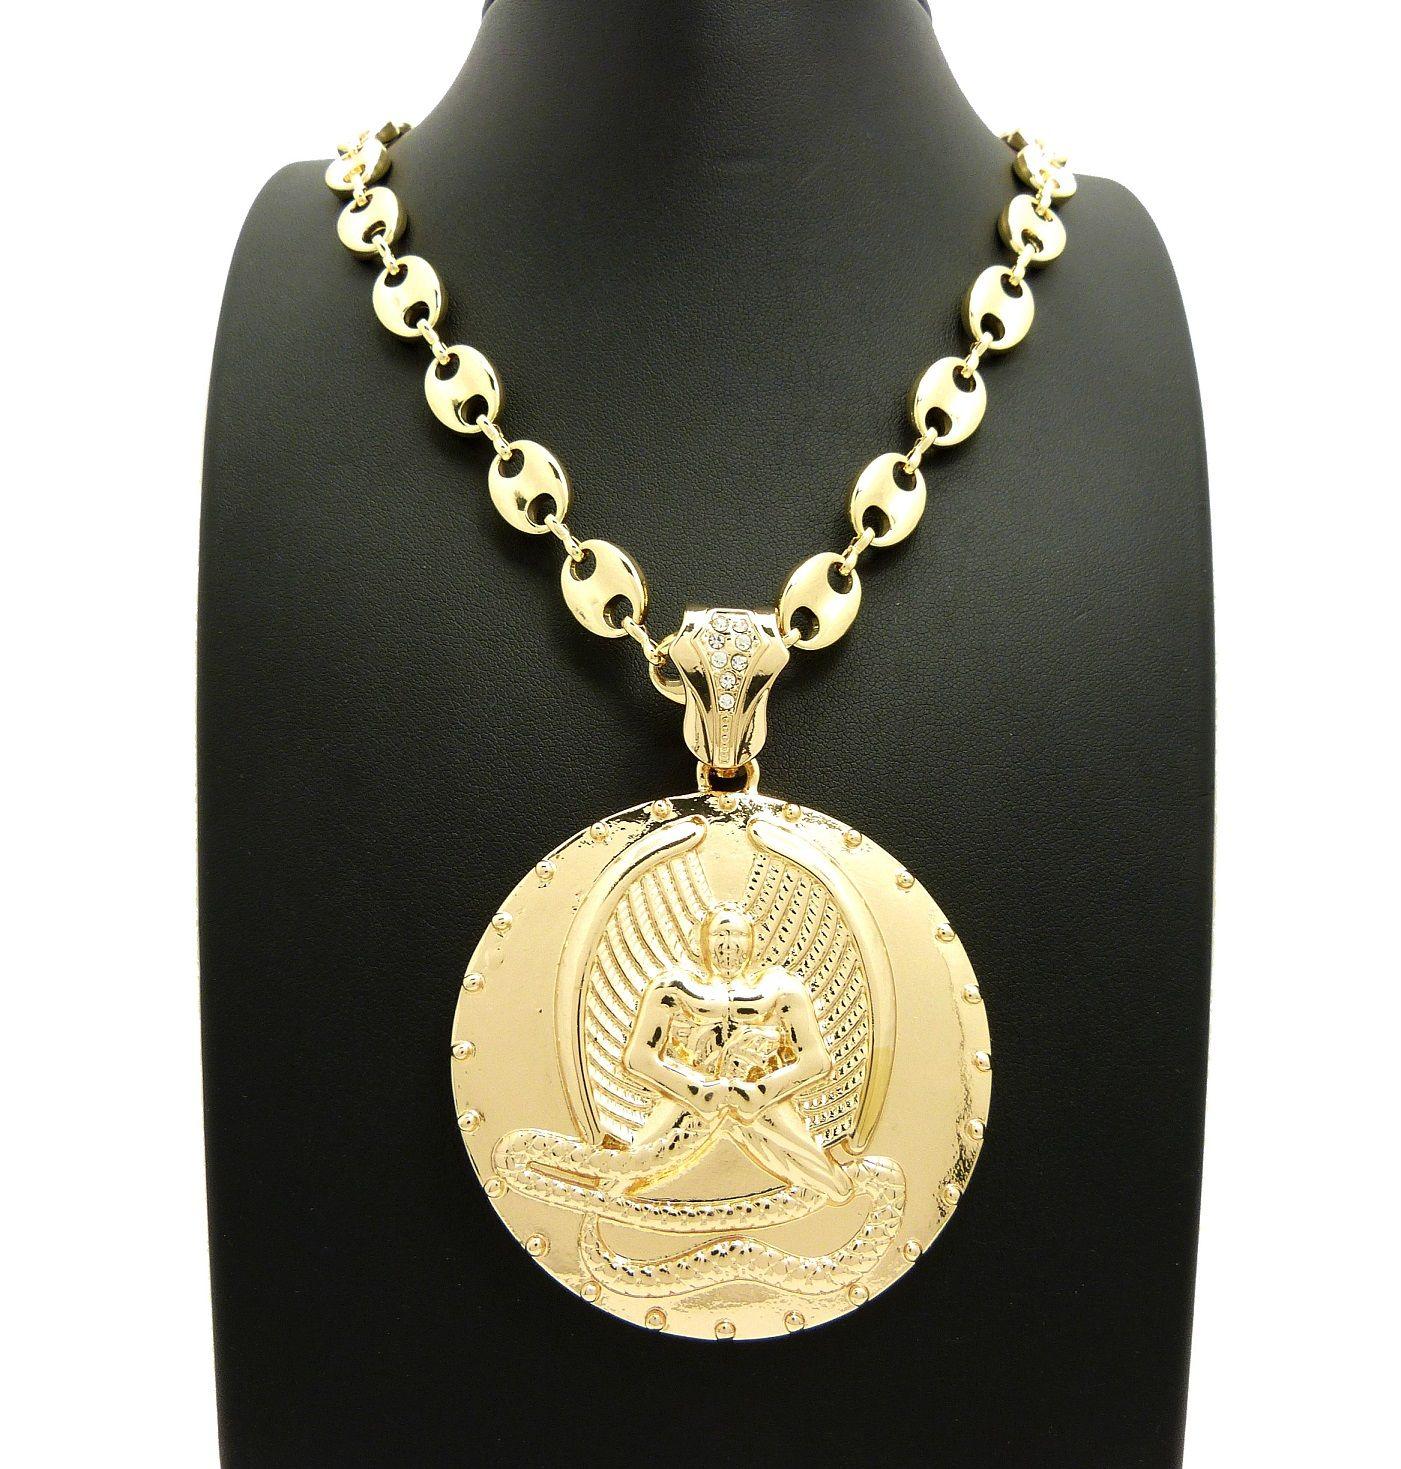 New euphanasia pendant 10mm30 marina link chain hip hop necklace euphanasia pendant 10mm30 marina link chain hip hop necklace aloadofball Images